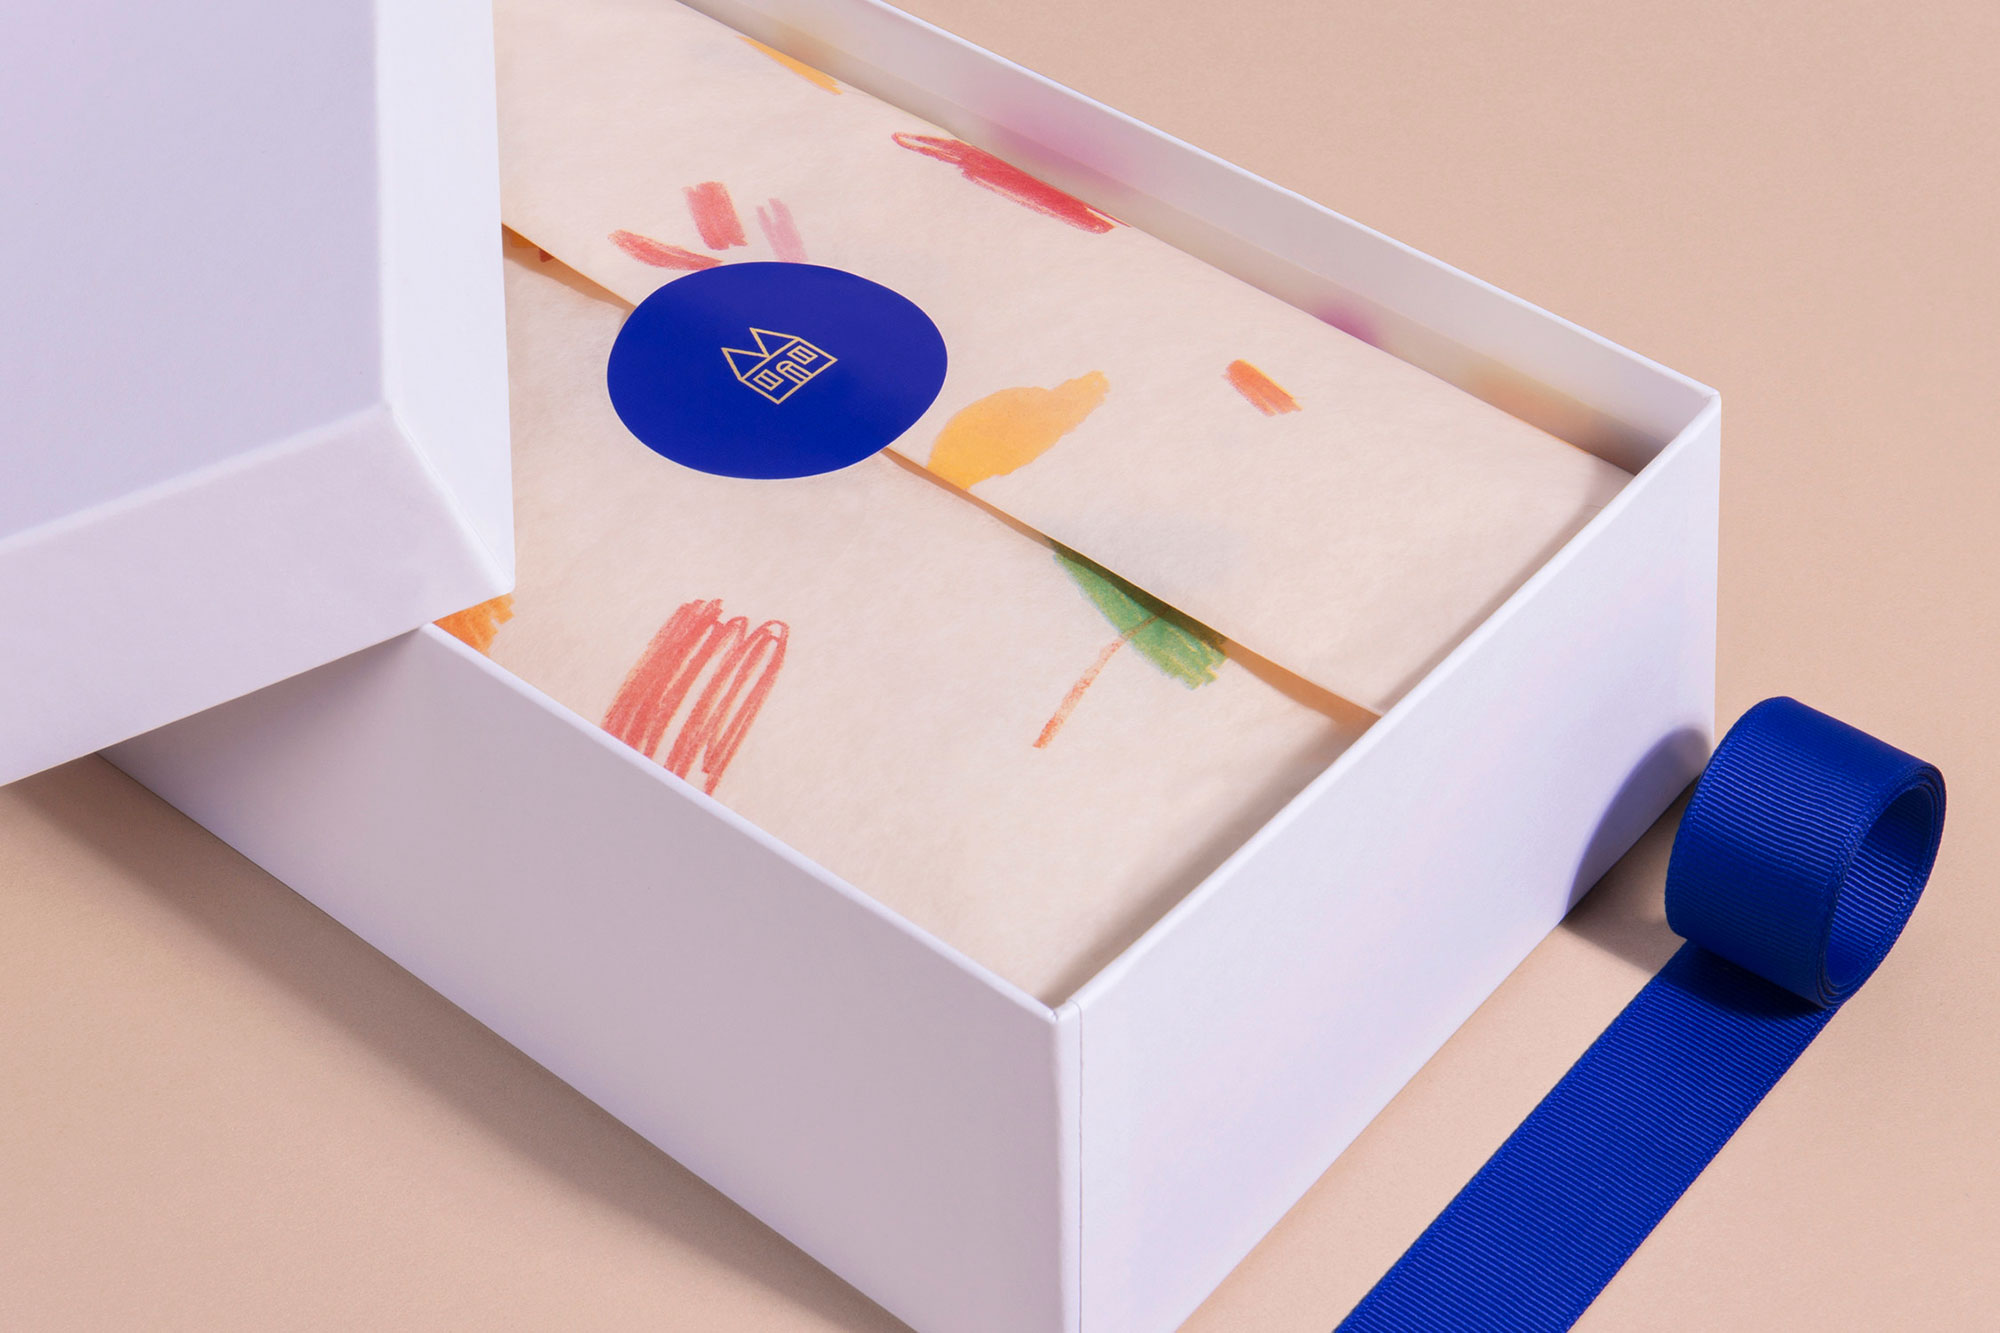 ma-packaging-01-2000px.jpg